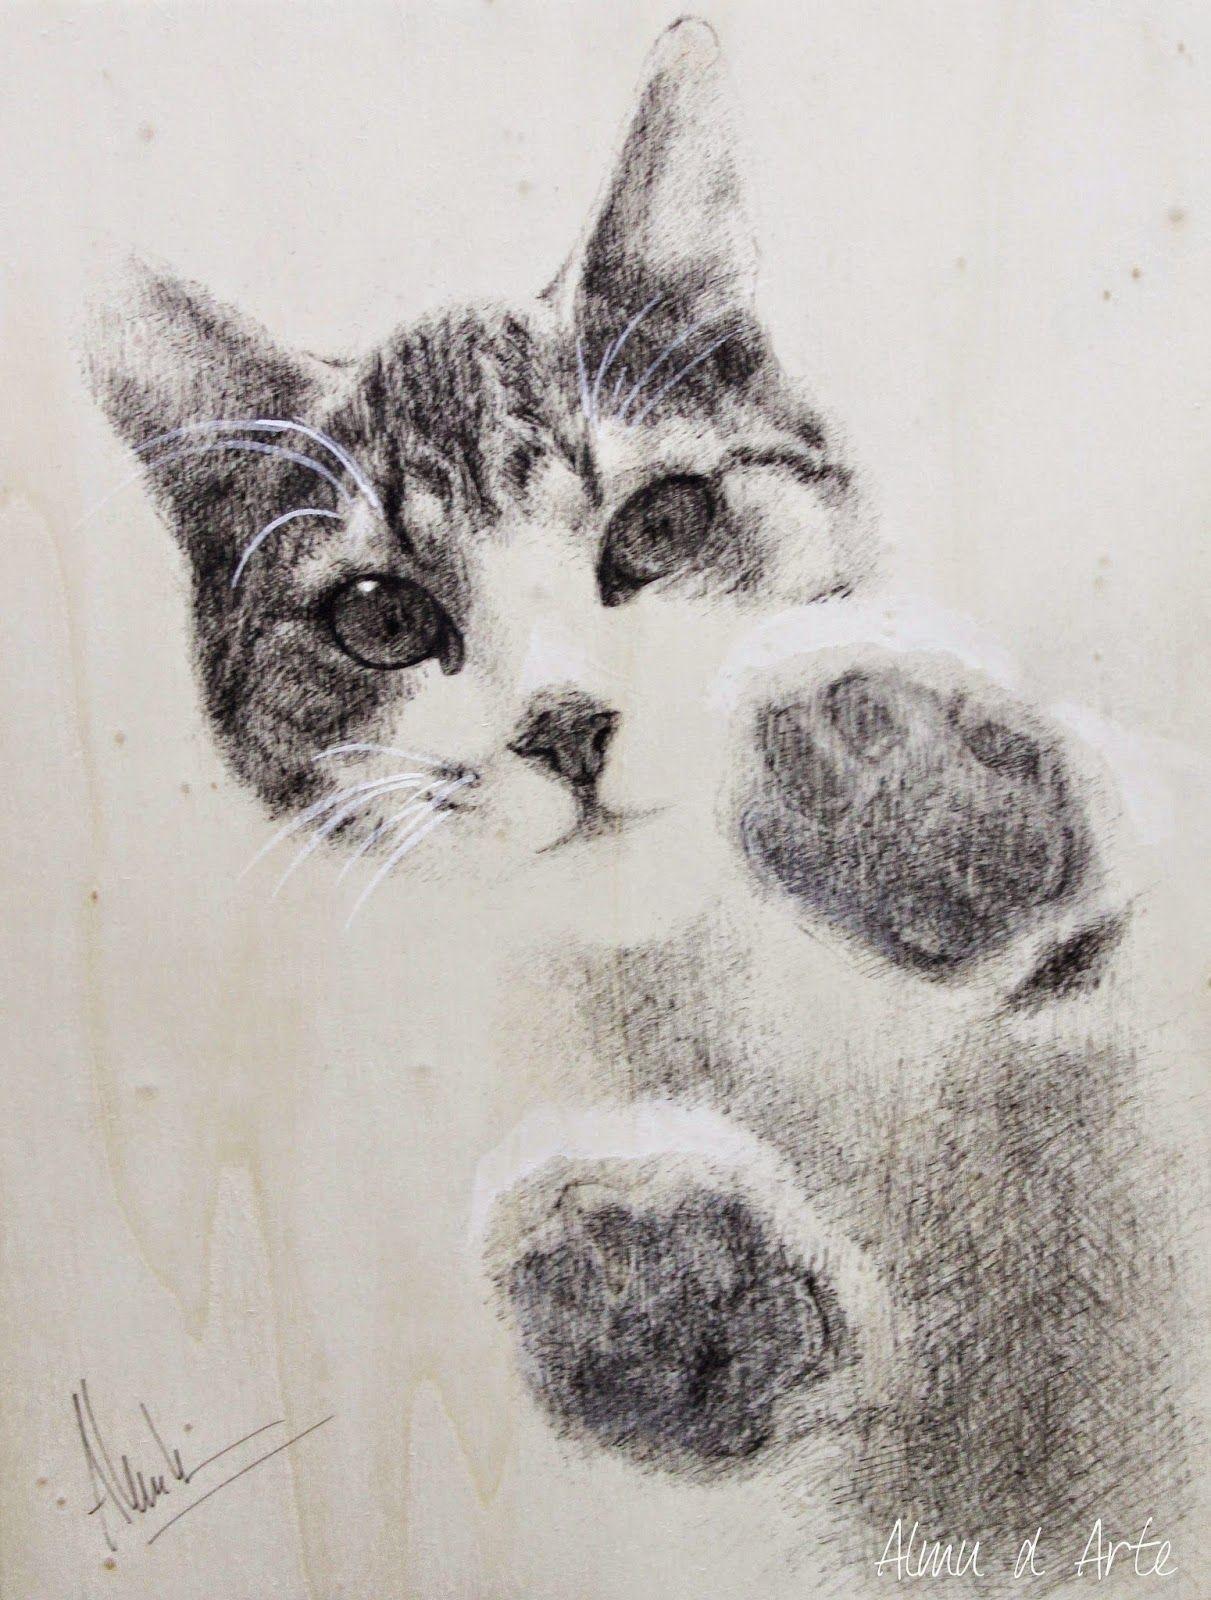 gatos dibujos a lapiz - Buscar con Google | art that I like ...